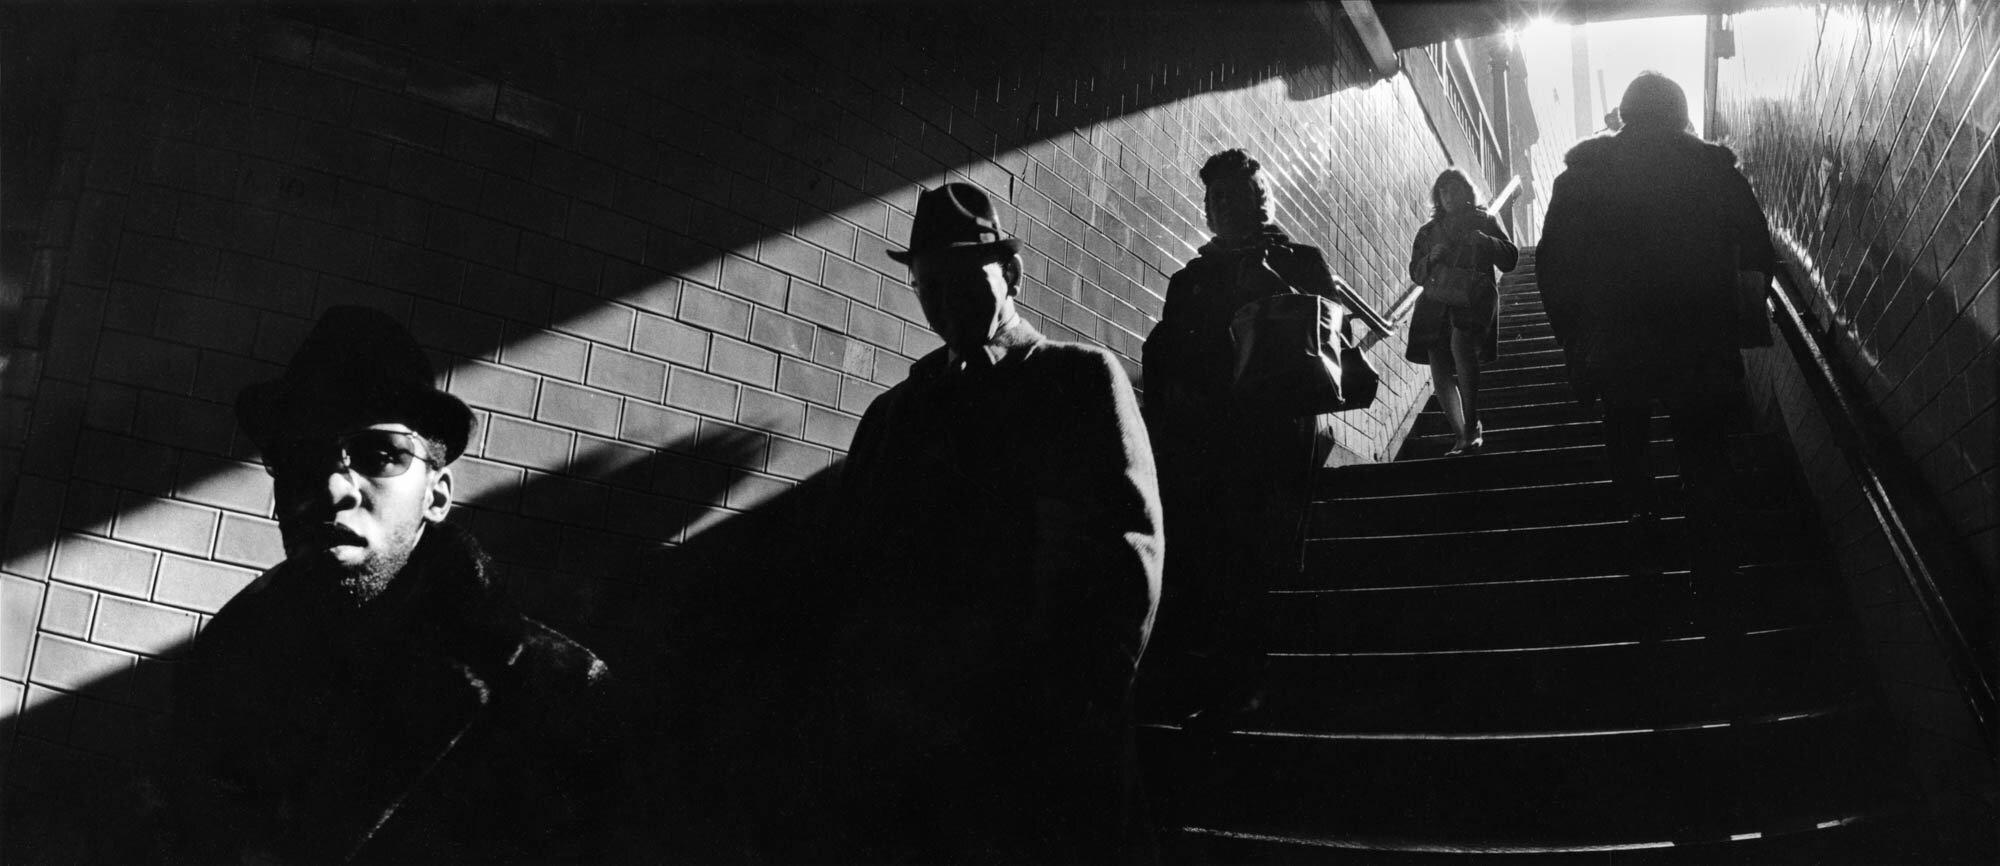 Harold Feinstein - Ascending Subway Stairs (New York, NY), 1970